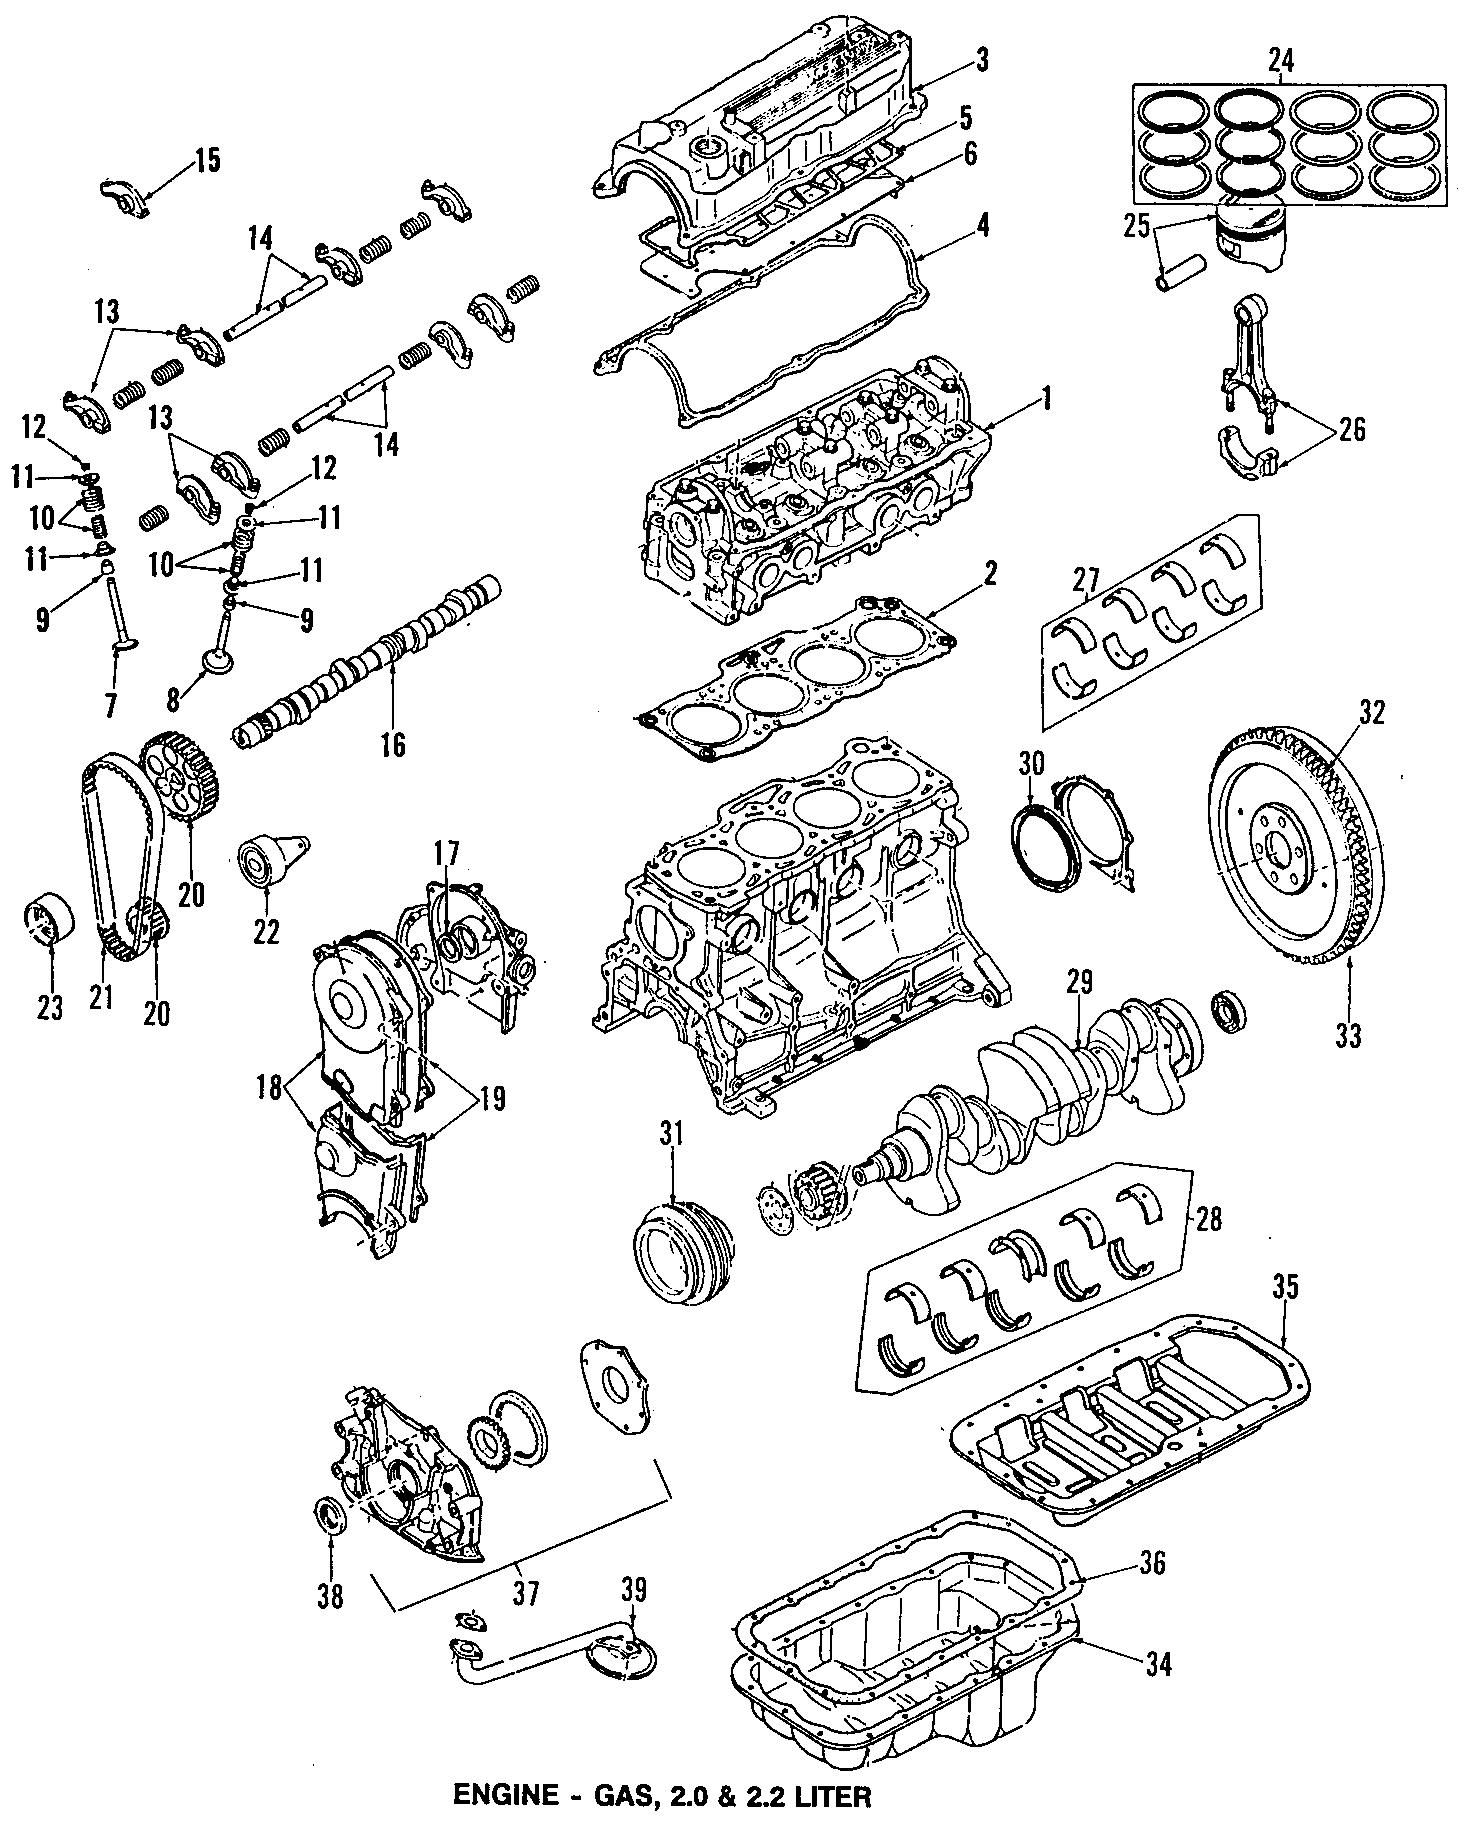 1989 Mazda B2200 Engine Timing Crankshaft Sprocket  626